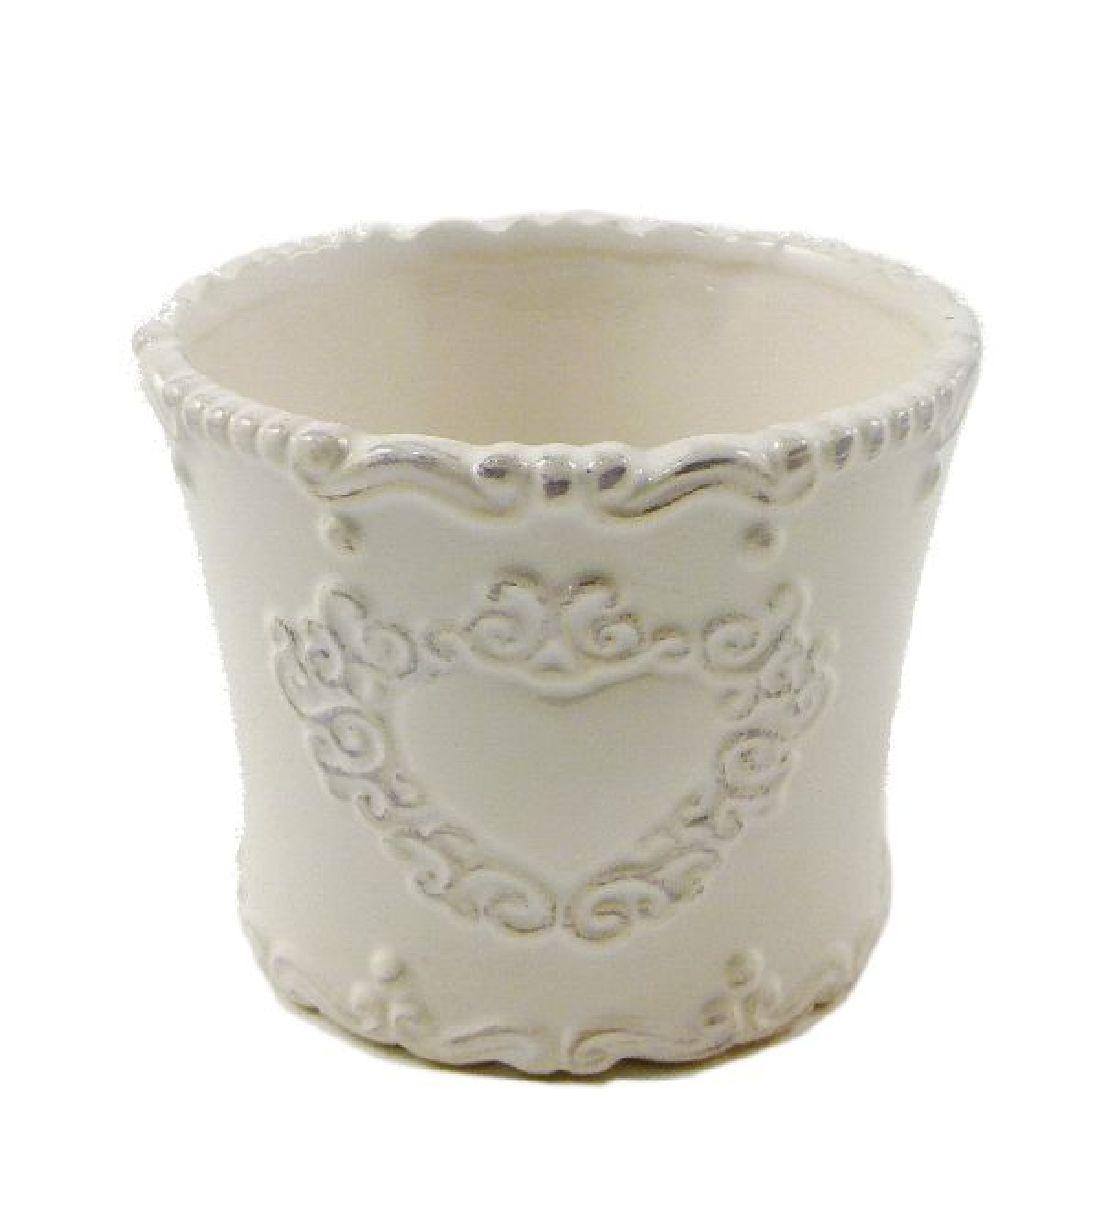 Keramik Topf Sweetheart CREME-GLASIERT rund 12,5x9,5cm 44320